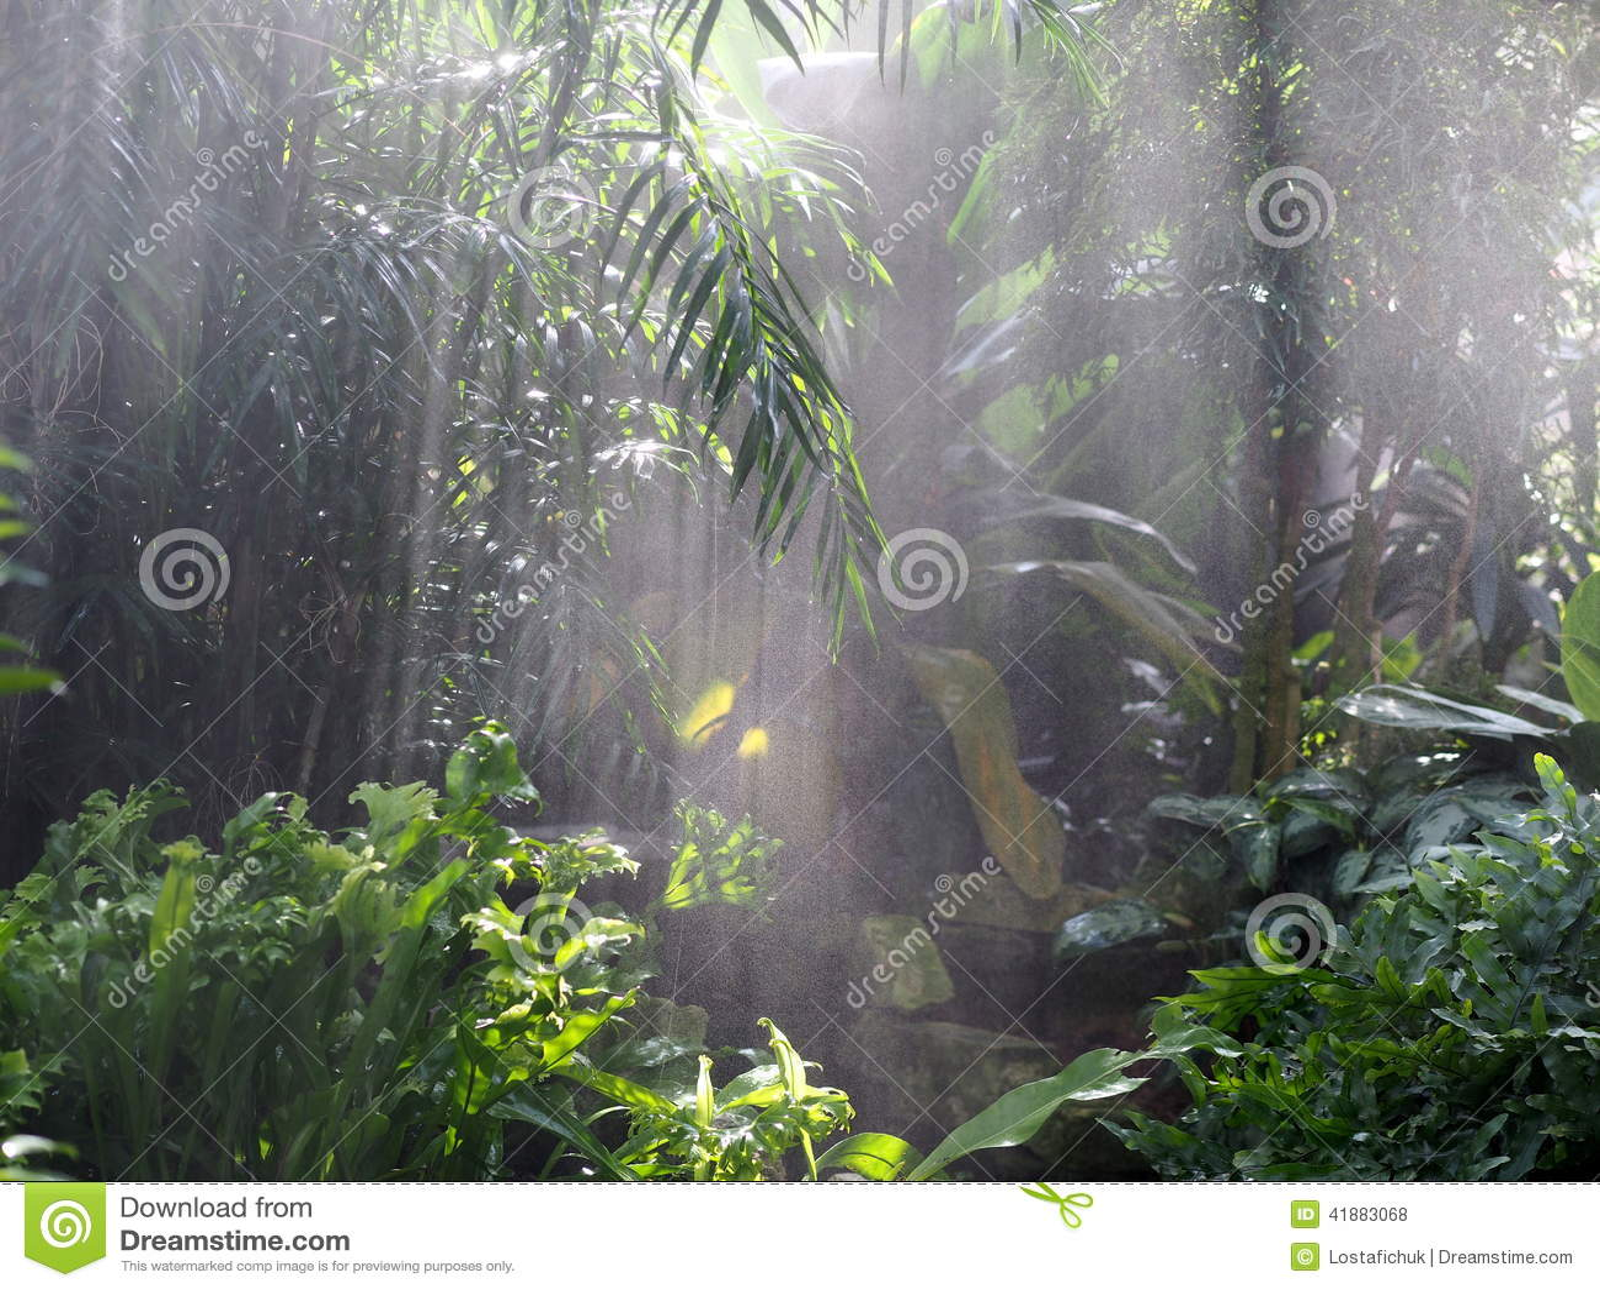 Green Vegetation With Mist